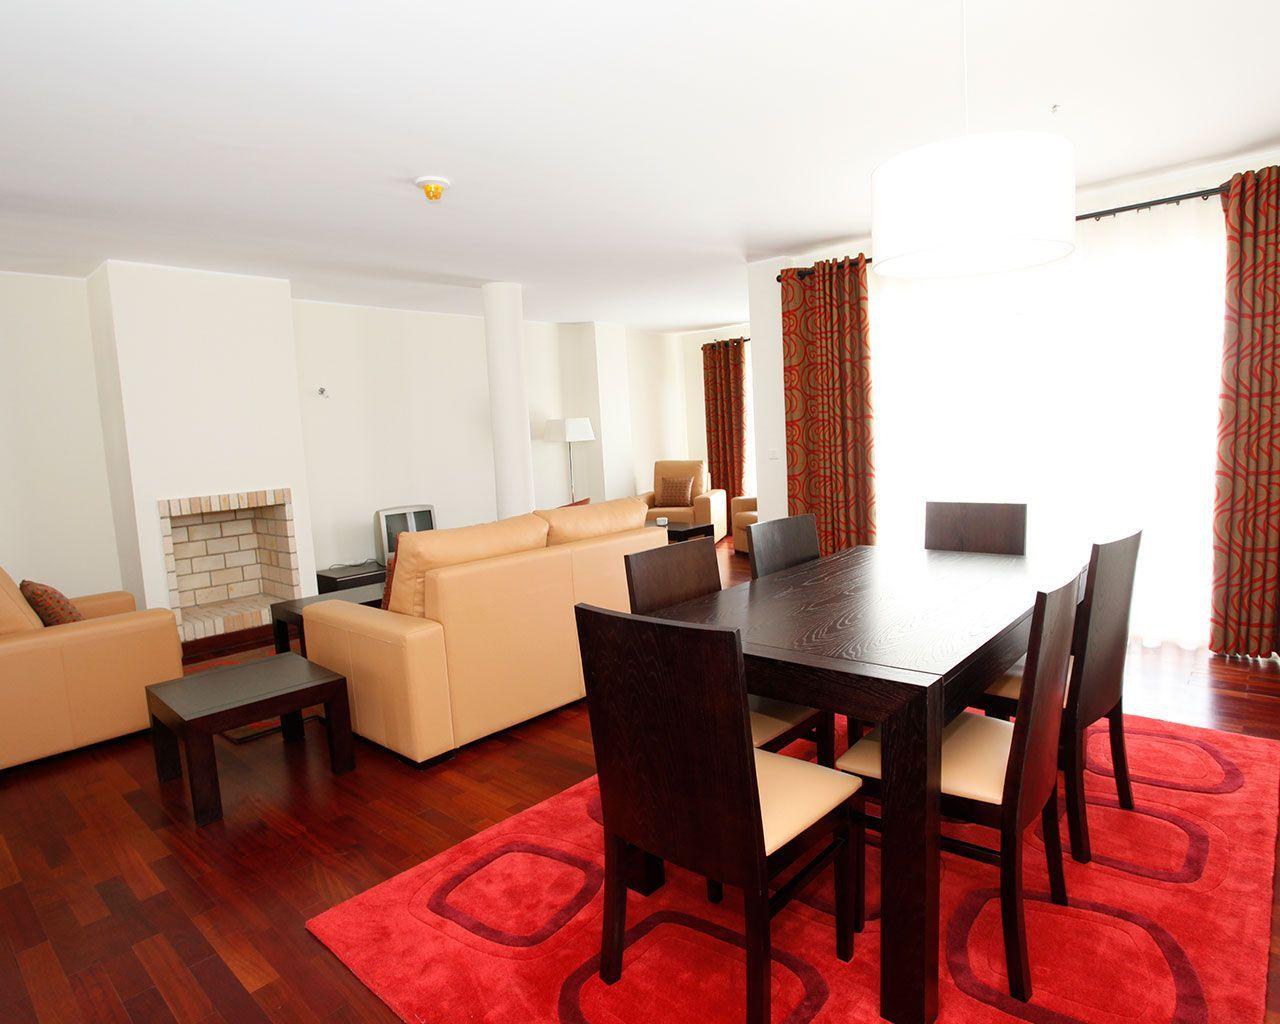 Sala de Estar - Apartamento T1 Standard